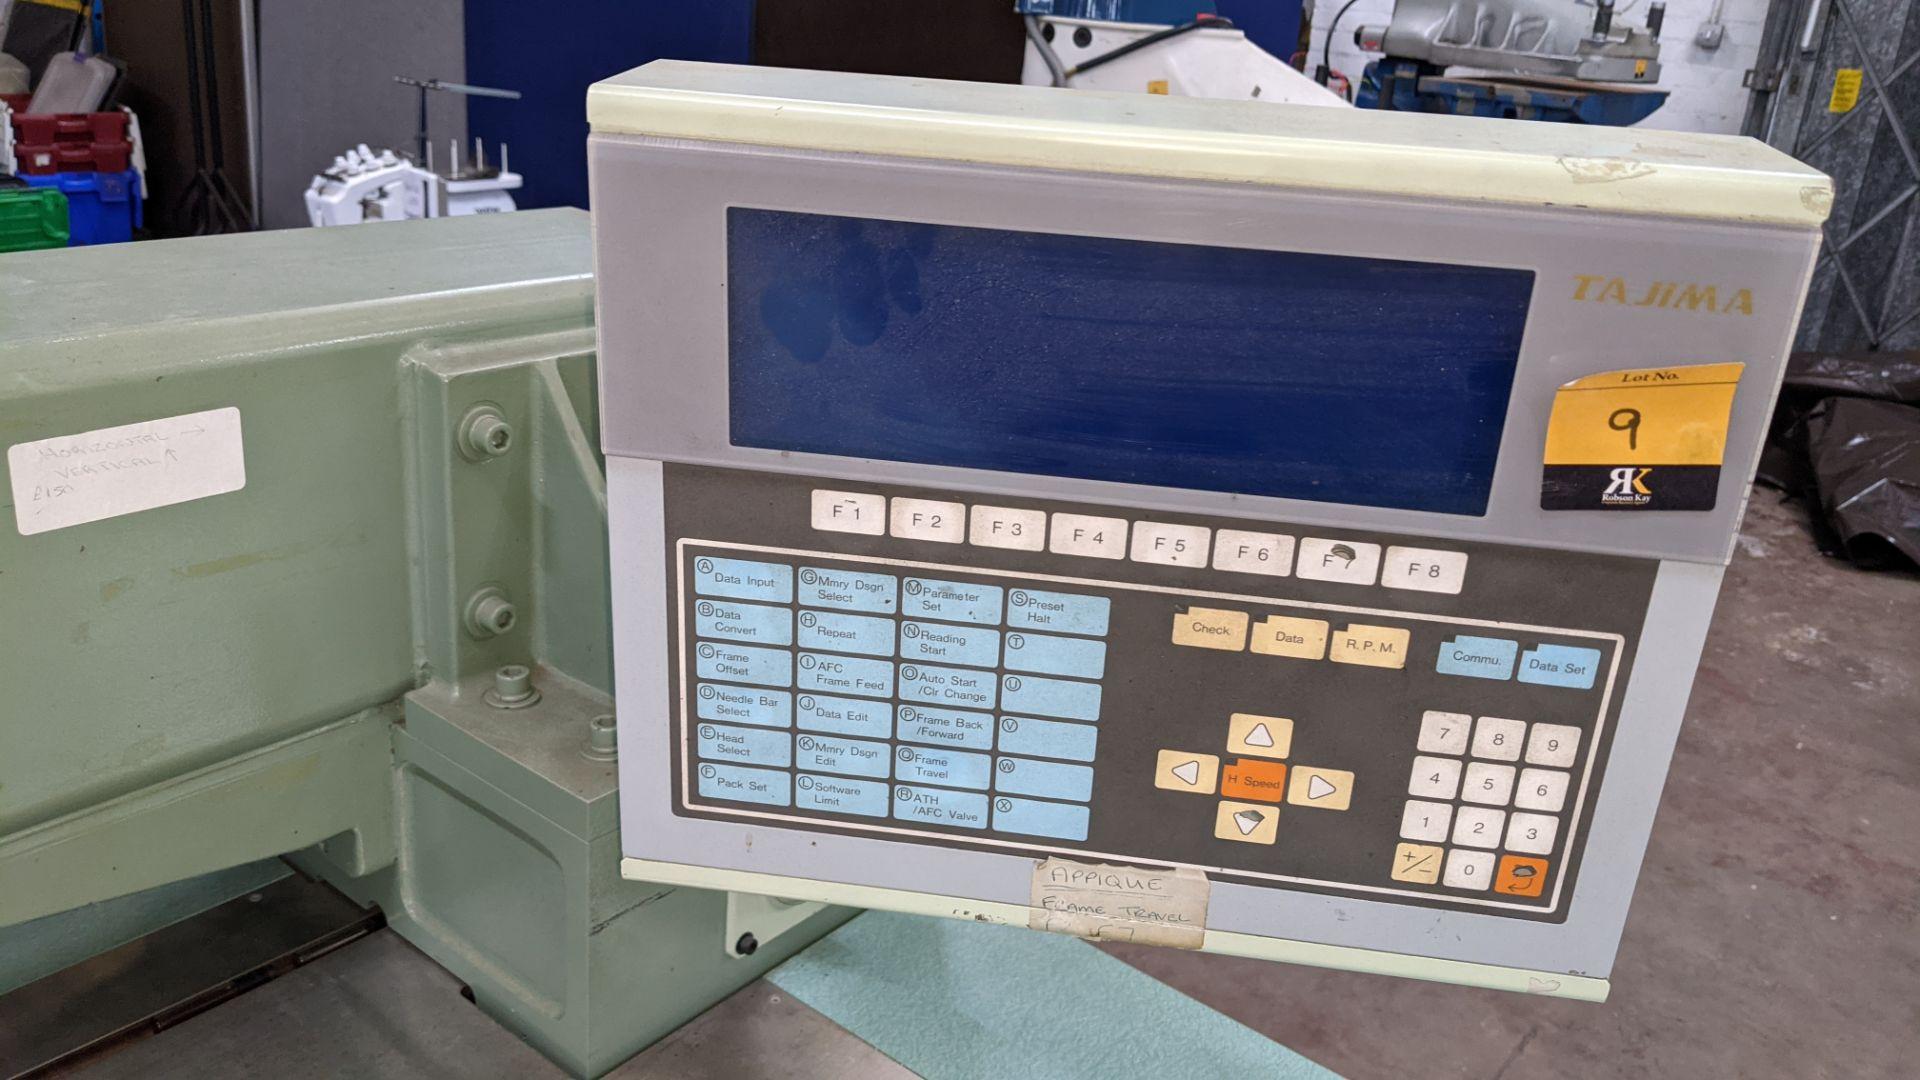 Tokai Tajima electronic 20 head automatic embroidery machine model TMEG-G620, manufacturing number 7 - Image 17 of 19